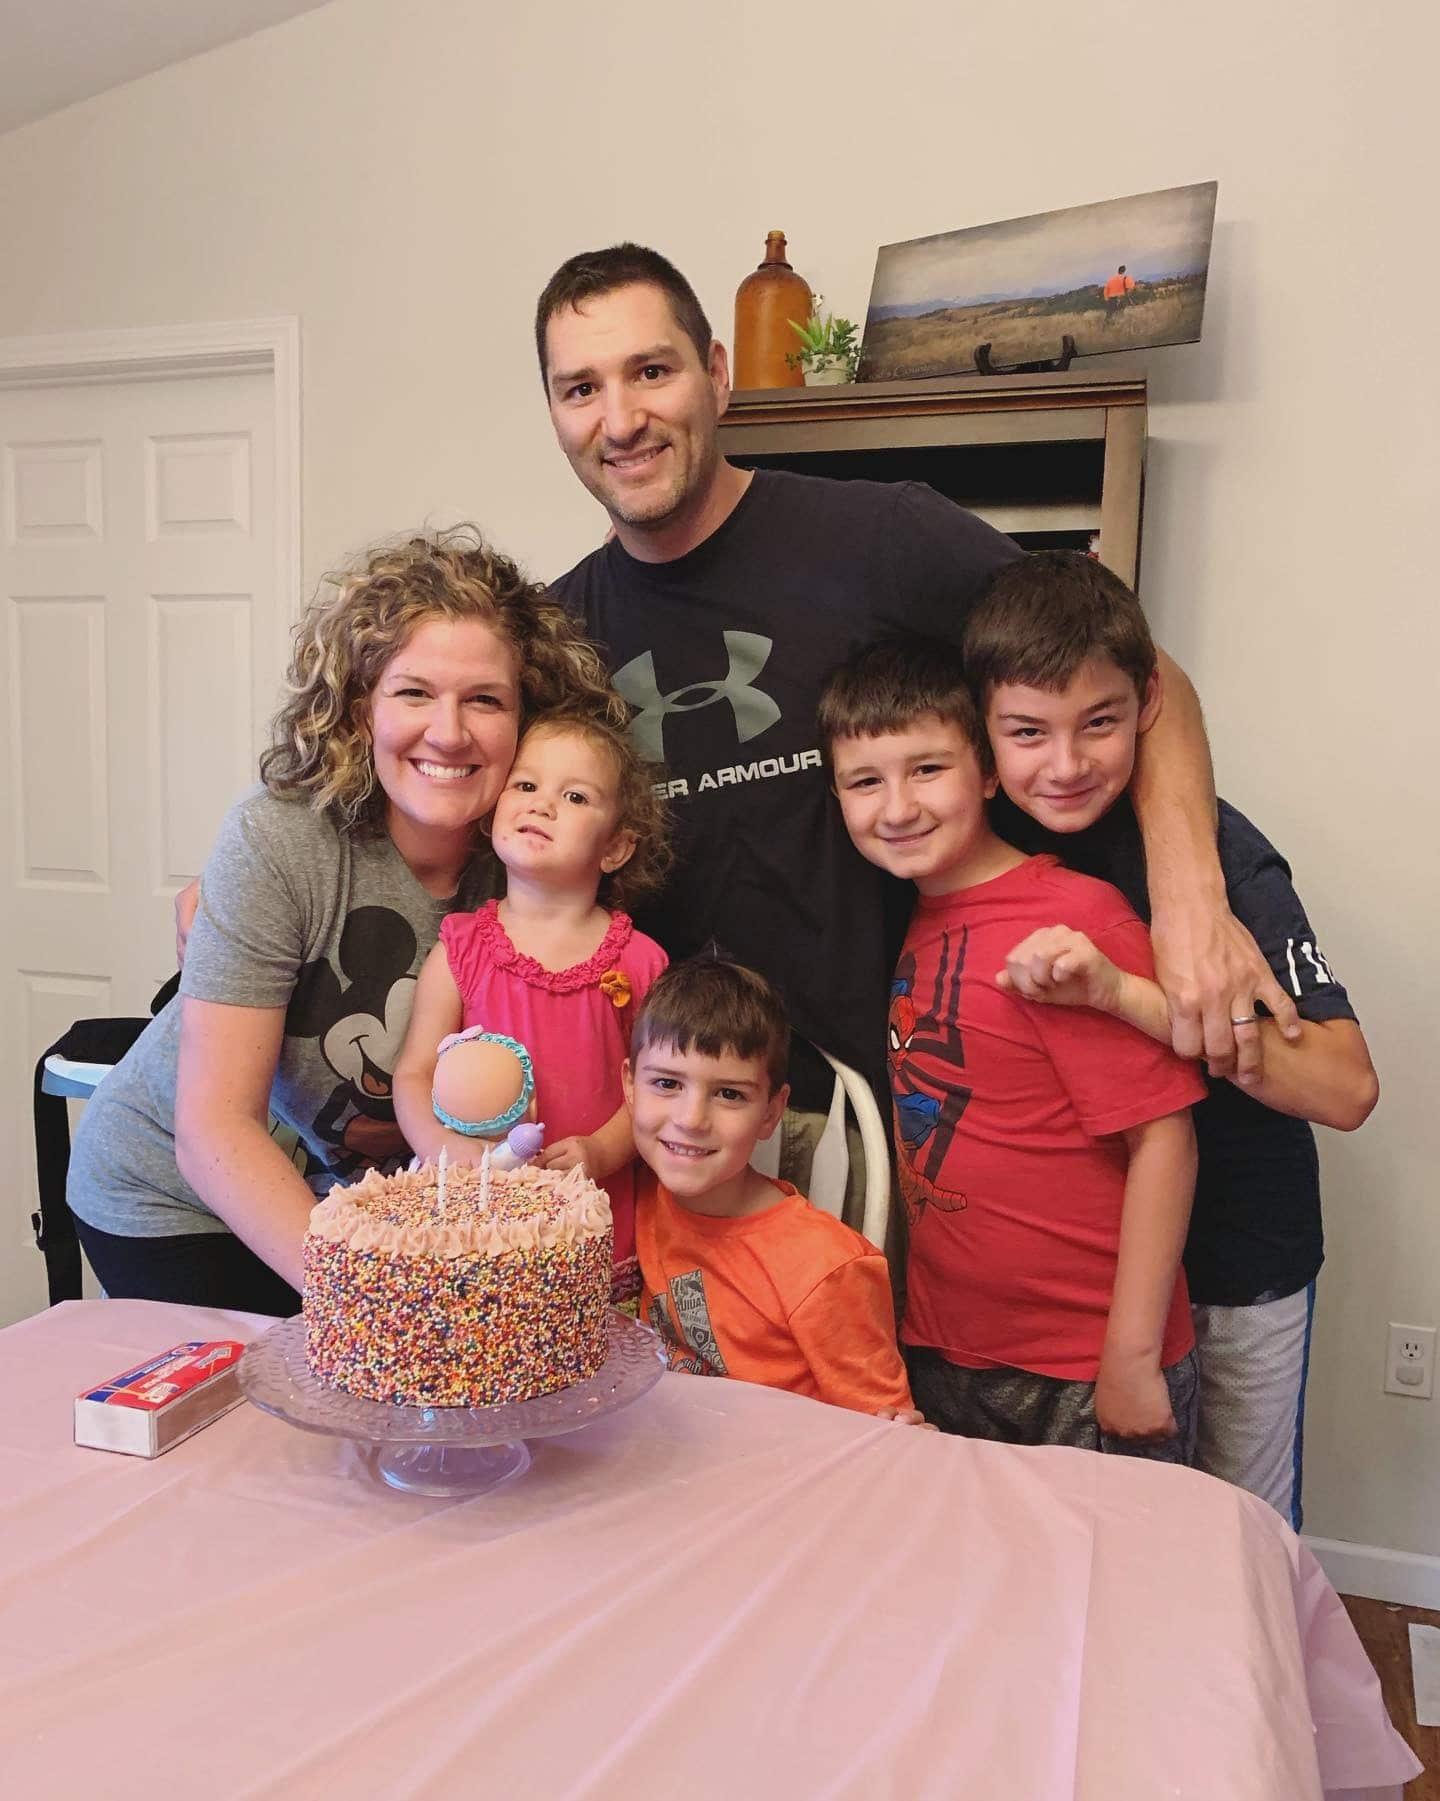 Joaquin and his family around a birthday cake